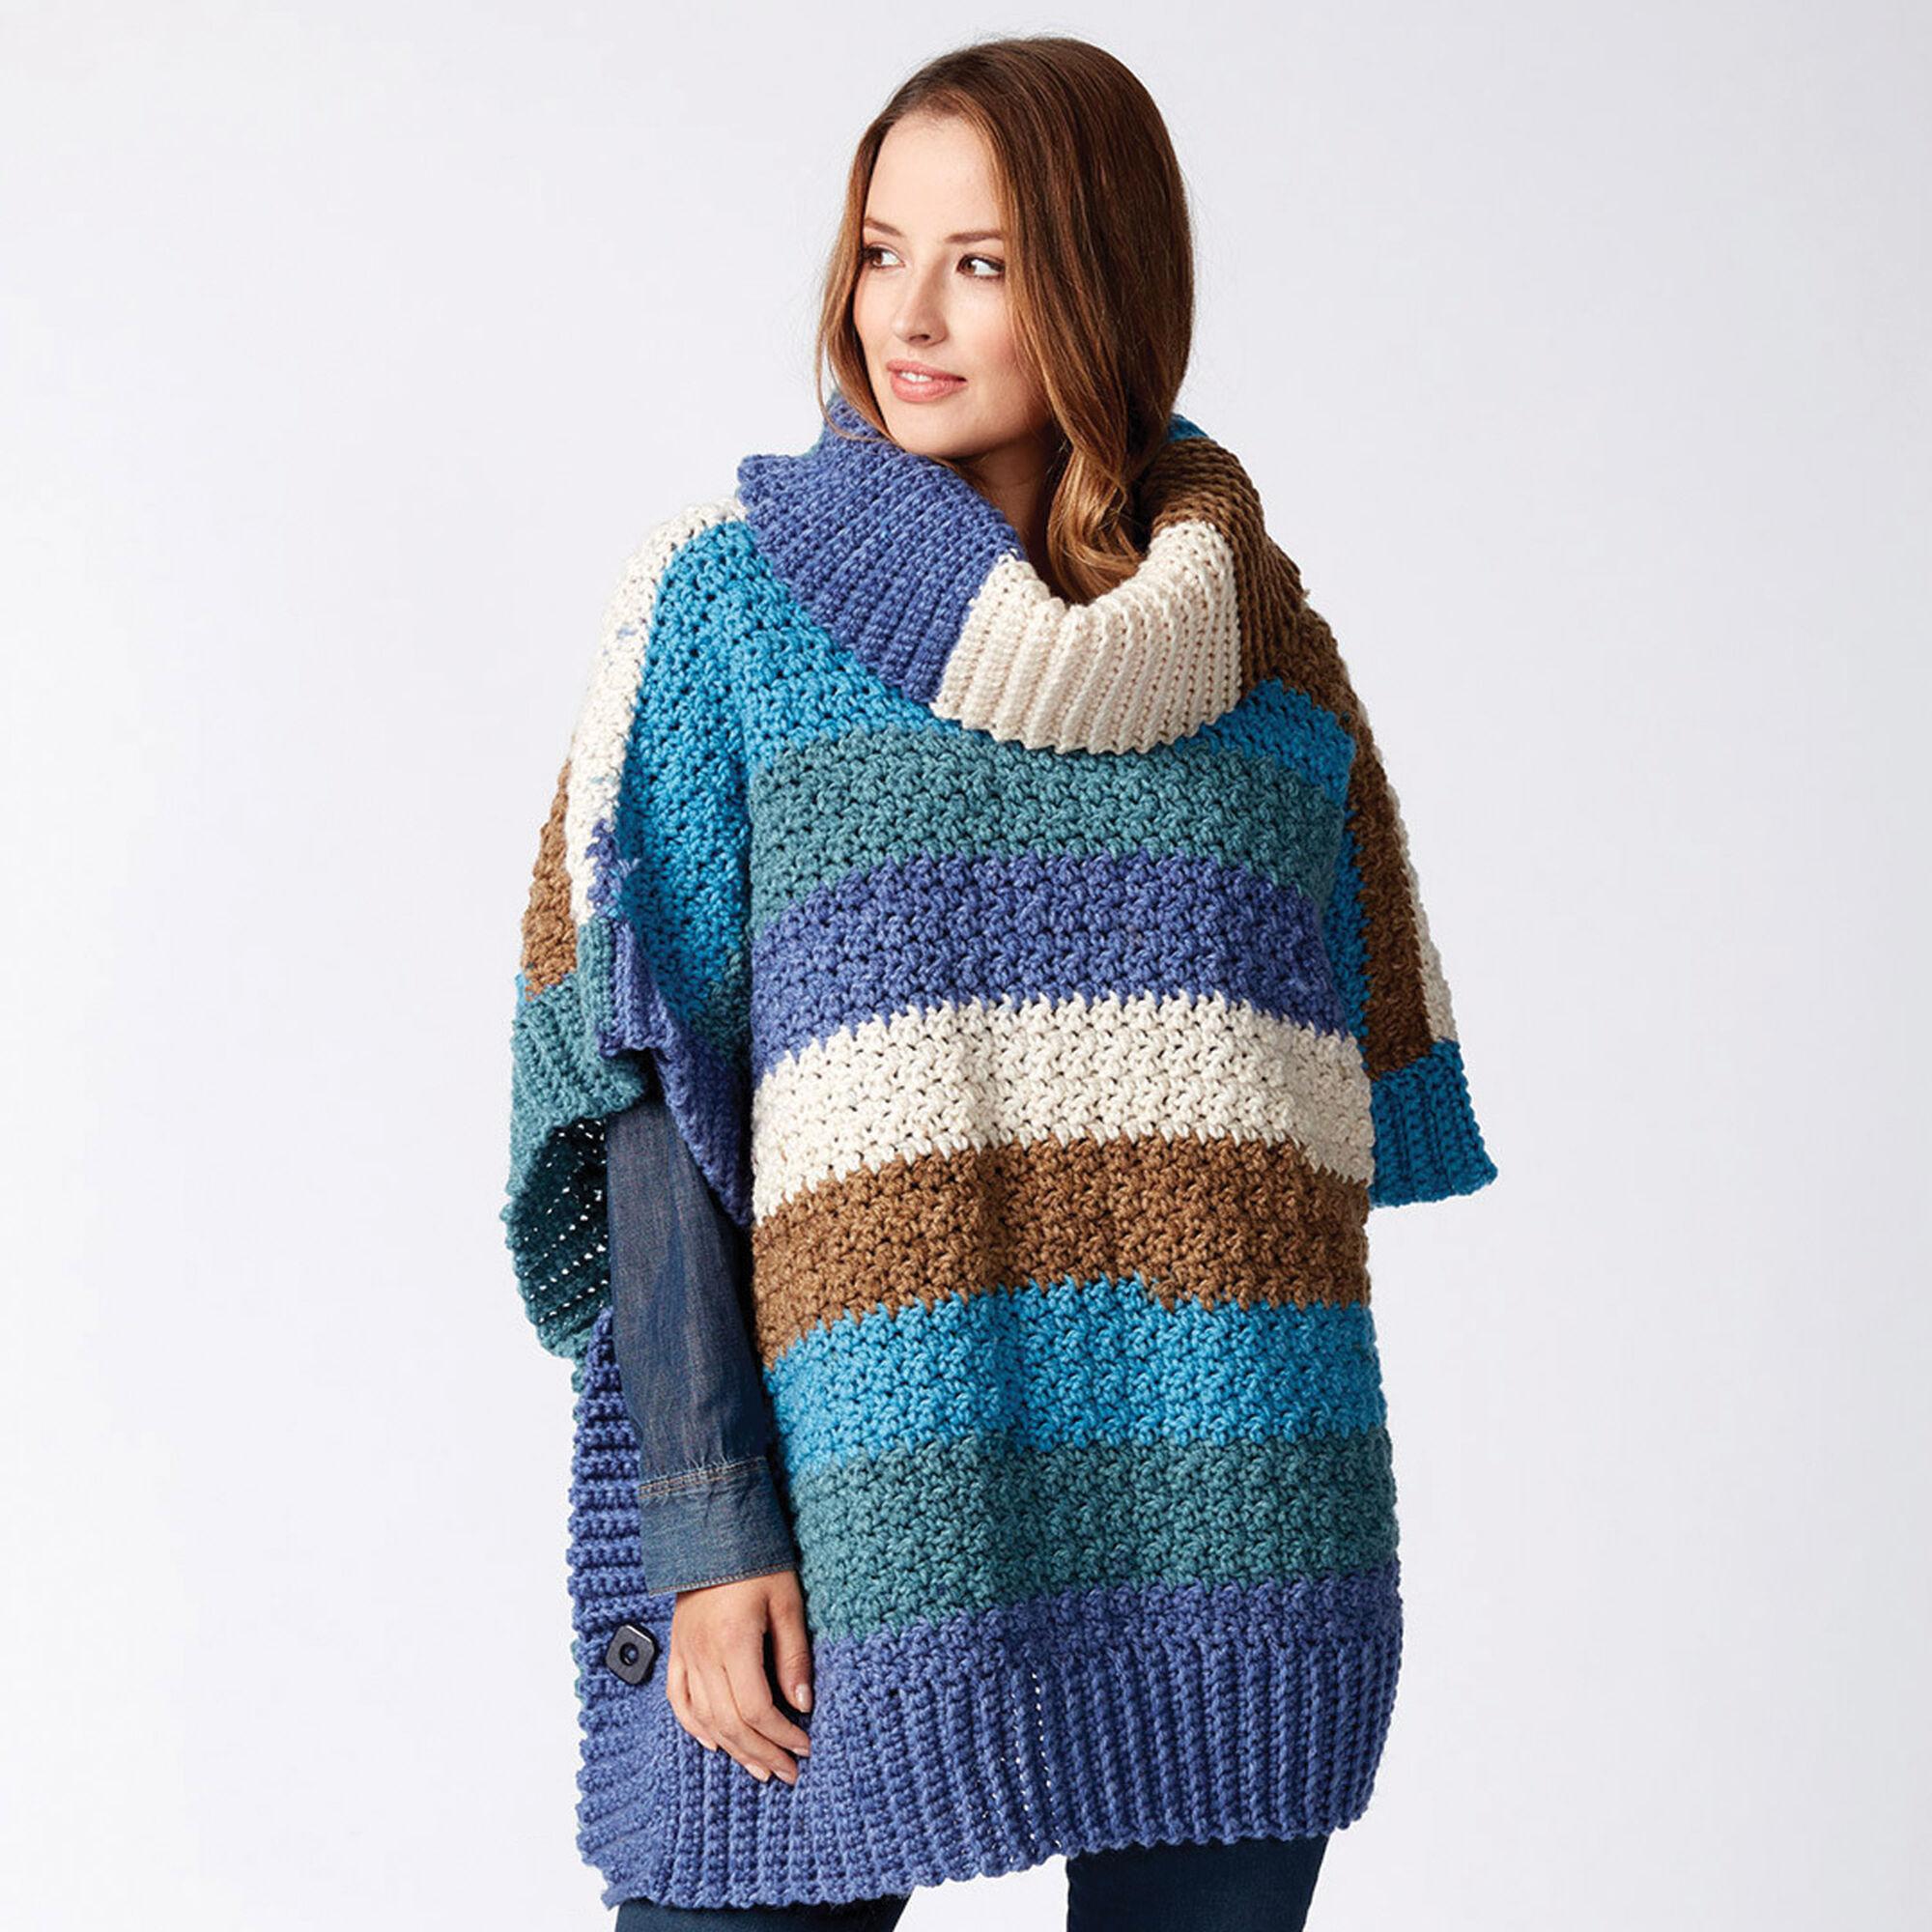 9e7768e3c99ea Bernat Mom and Me Crochet Ponchos, Snow Queen - Size 2 | Yarnspirations